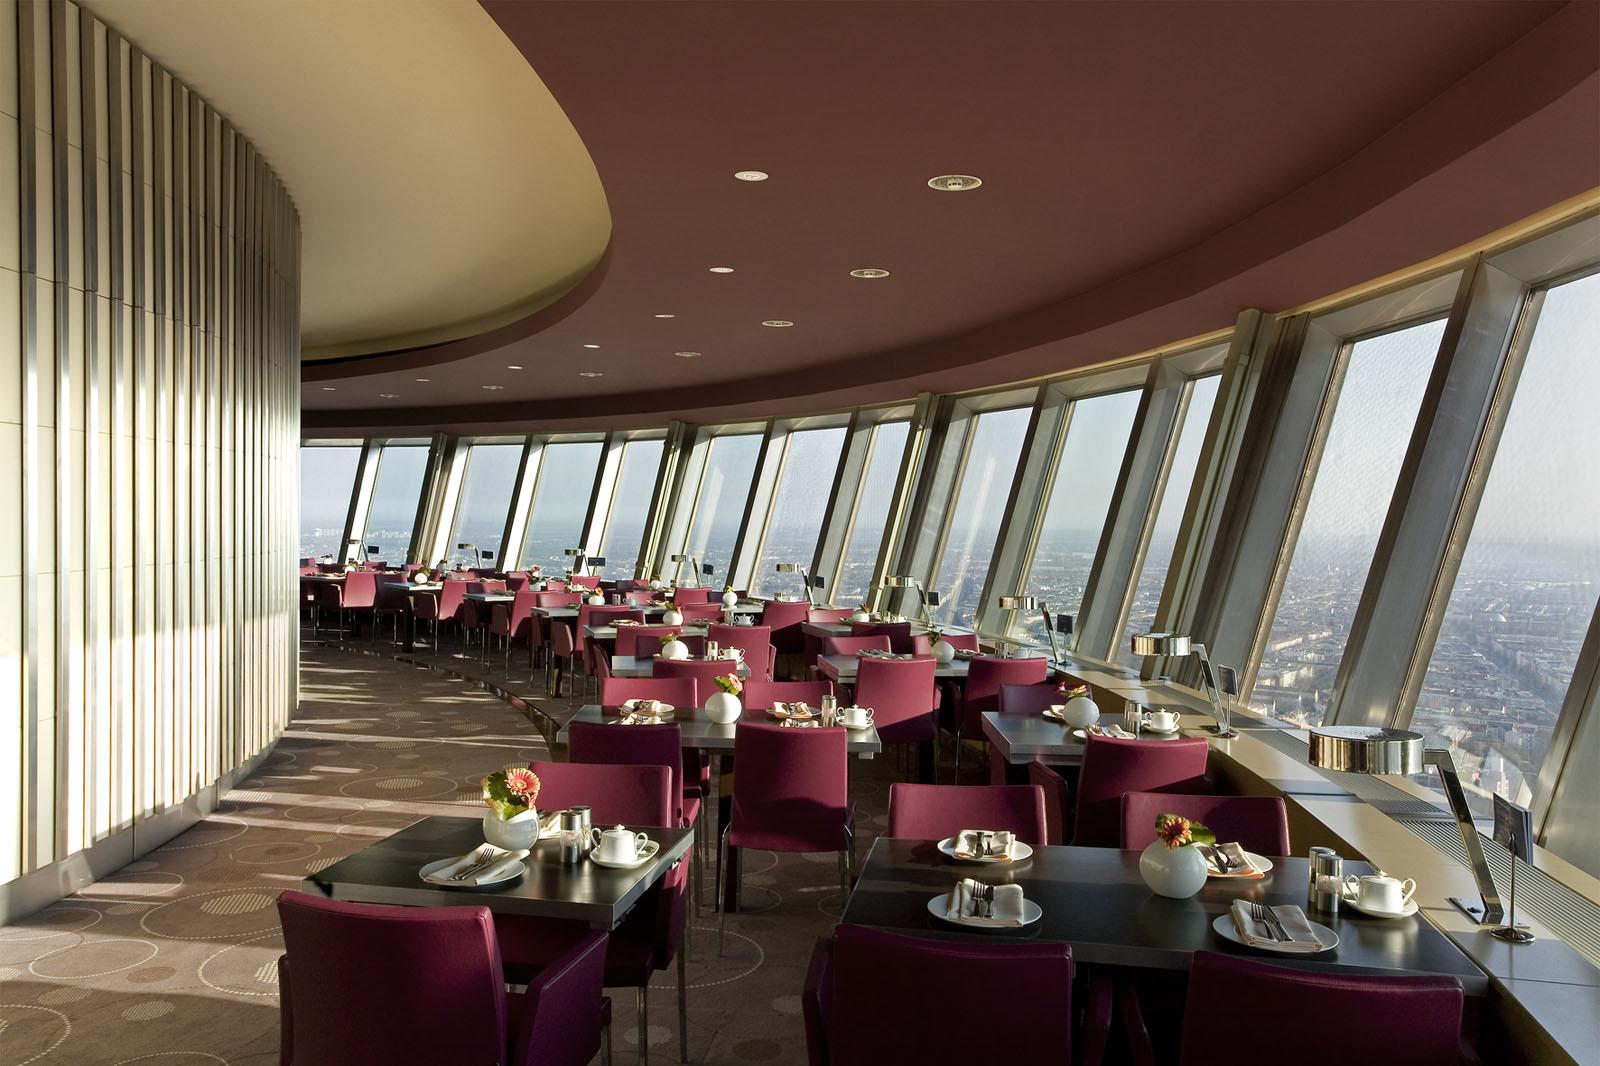 Restaurant Fernsehturm Berlin